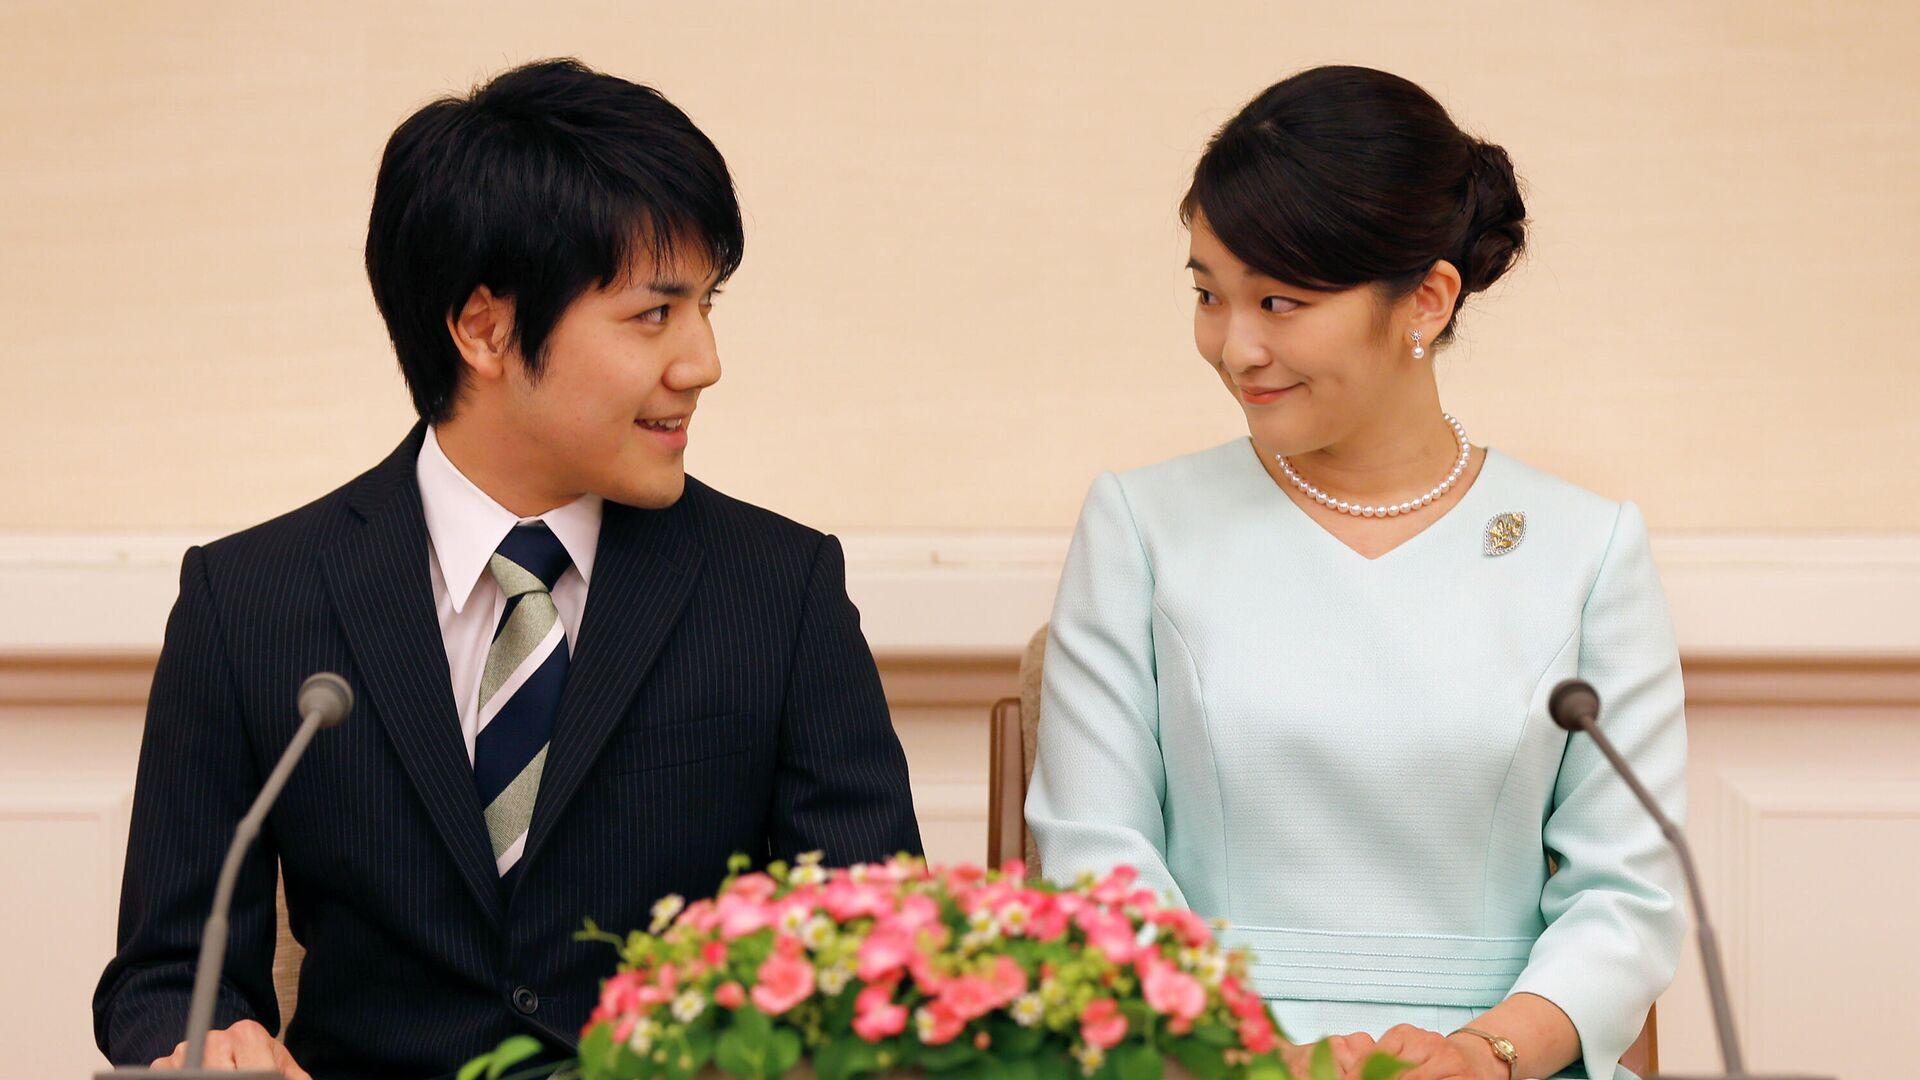 La princesa Mako junto a su prometido, Kei Komuro - Sputnik Mundo, 1920, 29.09.2021